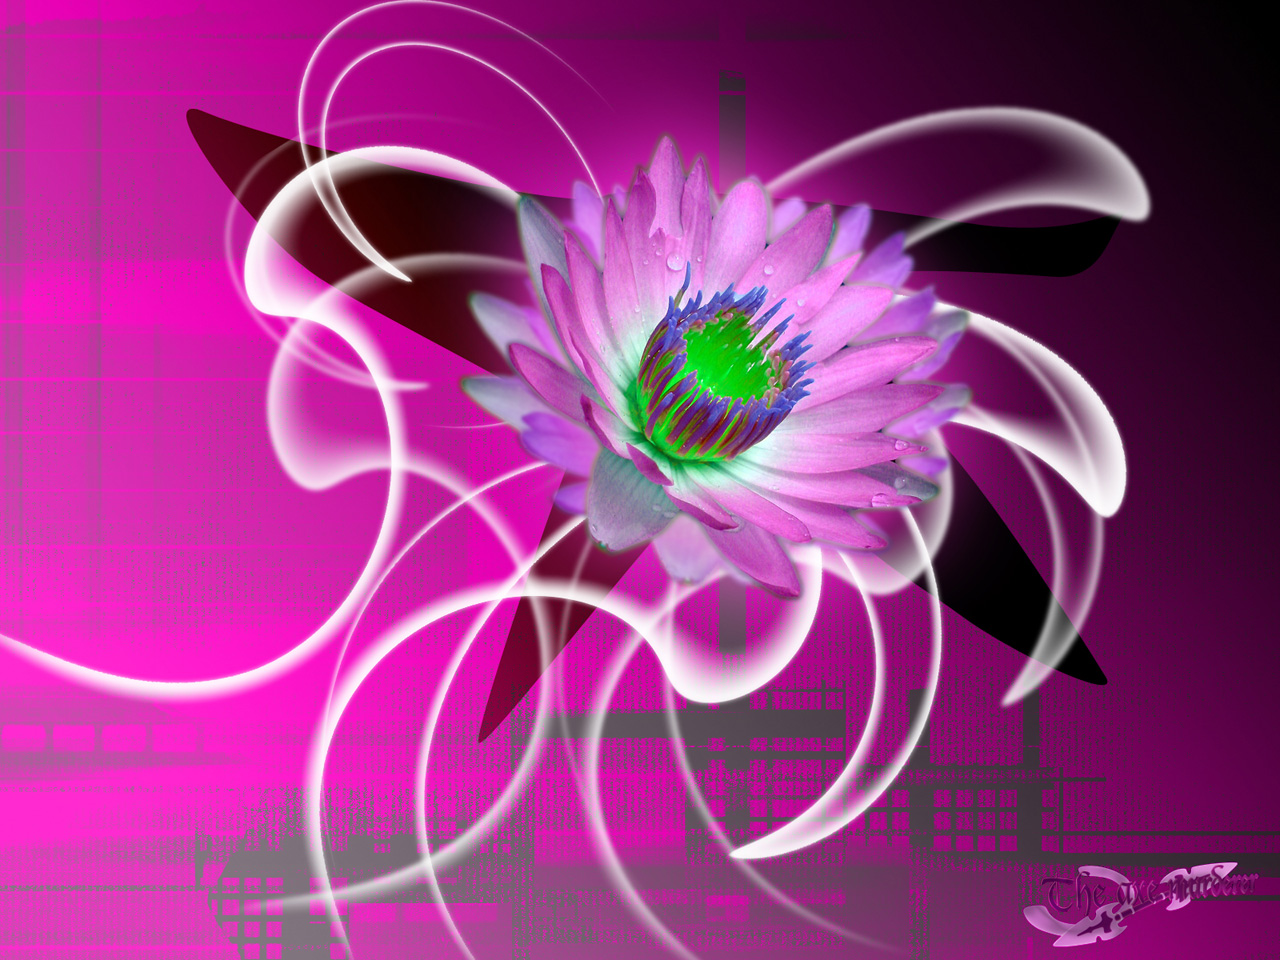 Wallpaper jolie fleur Design Web